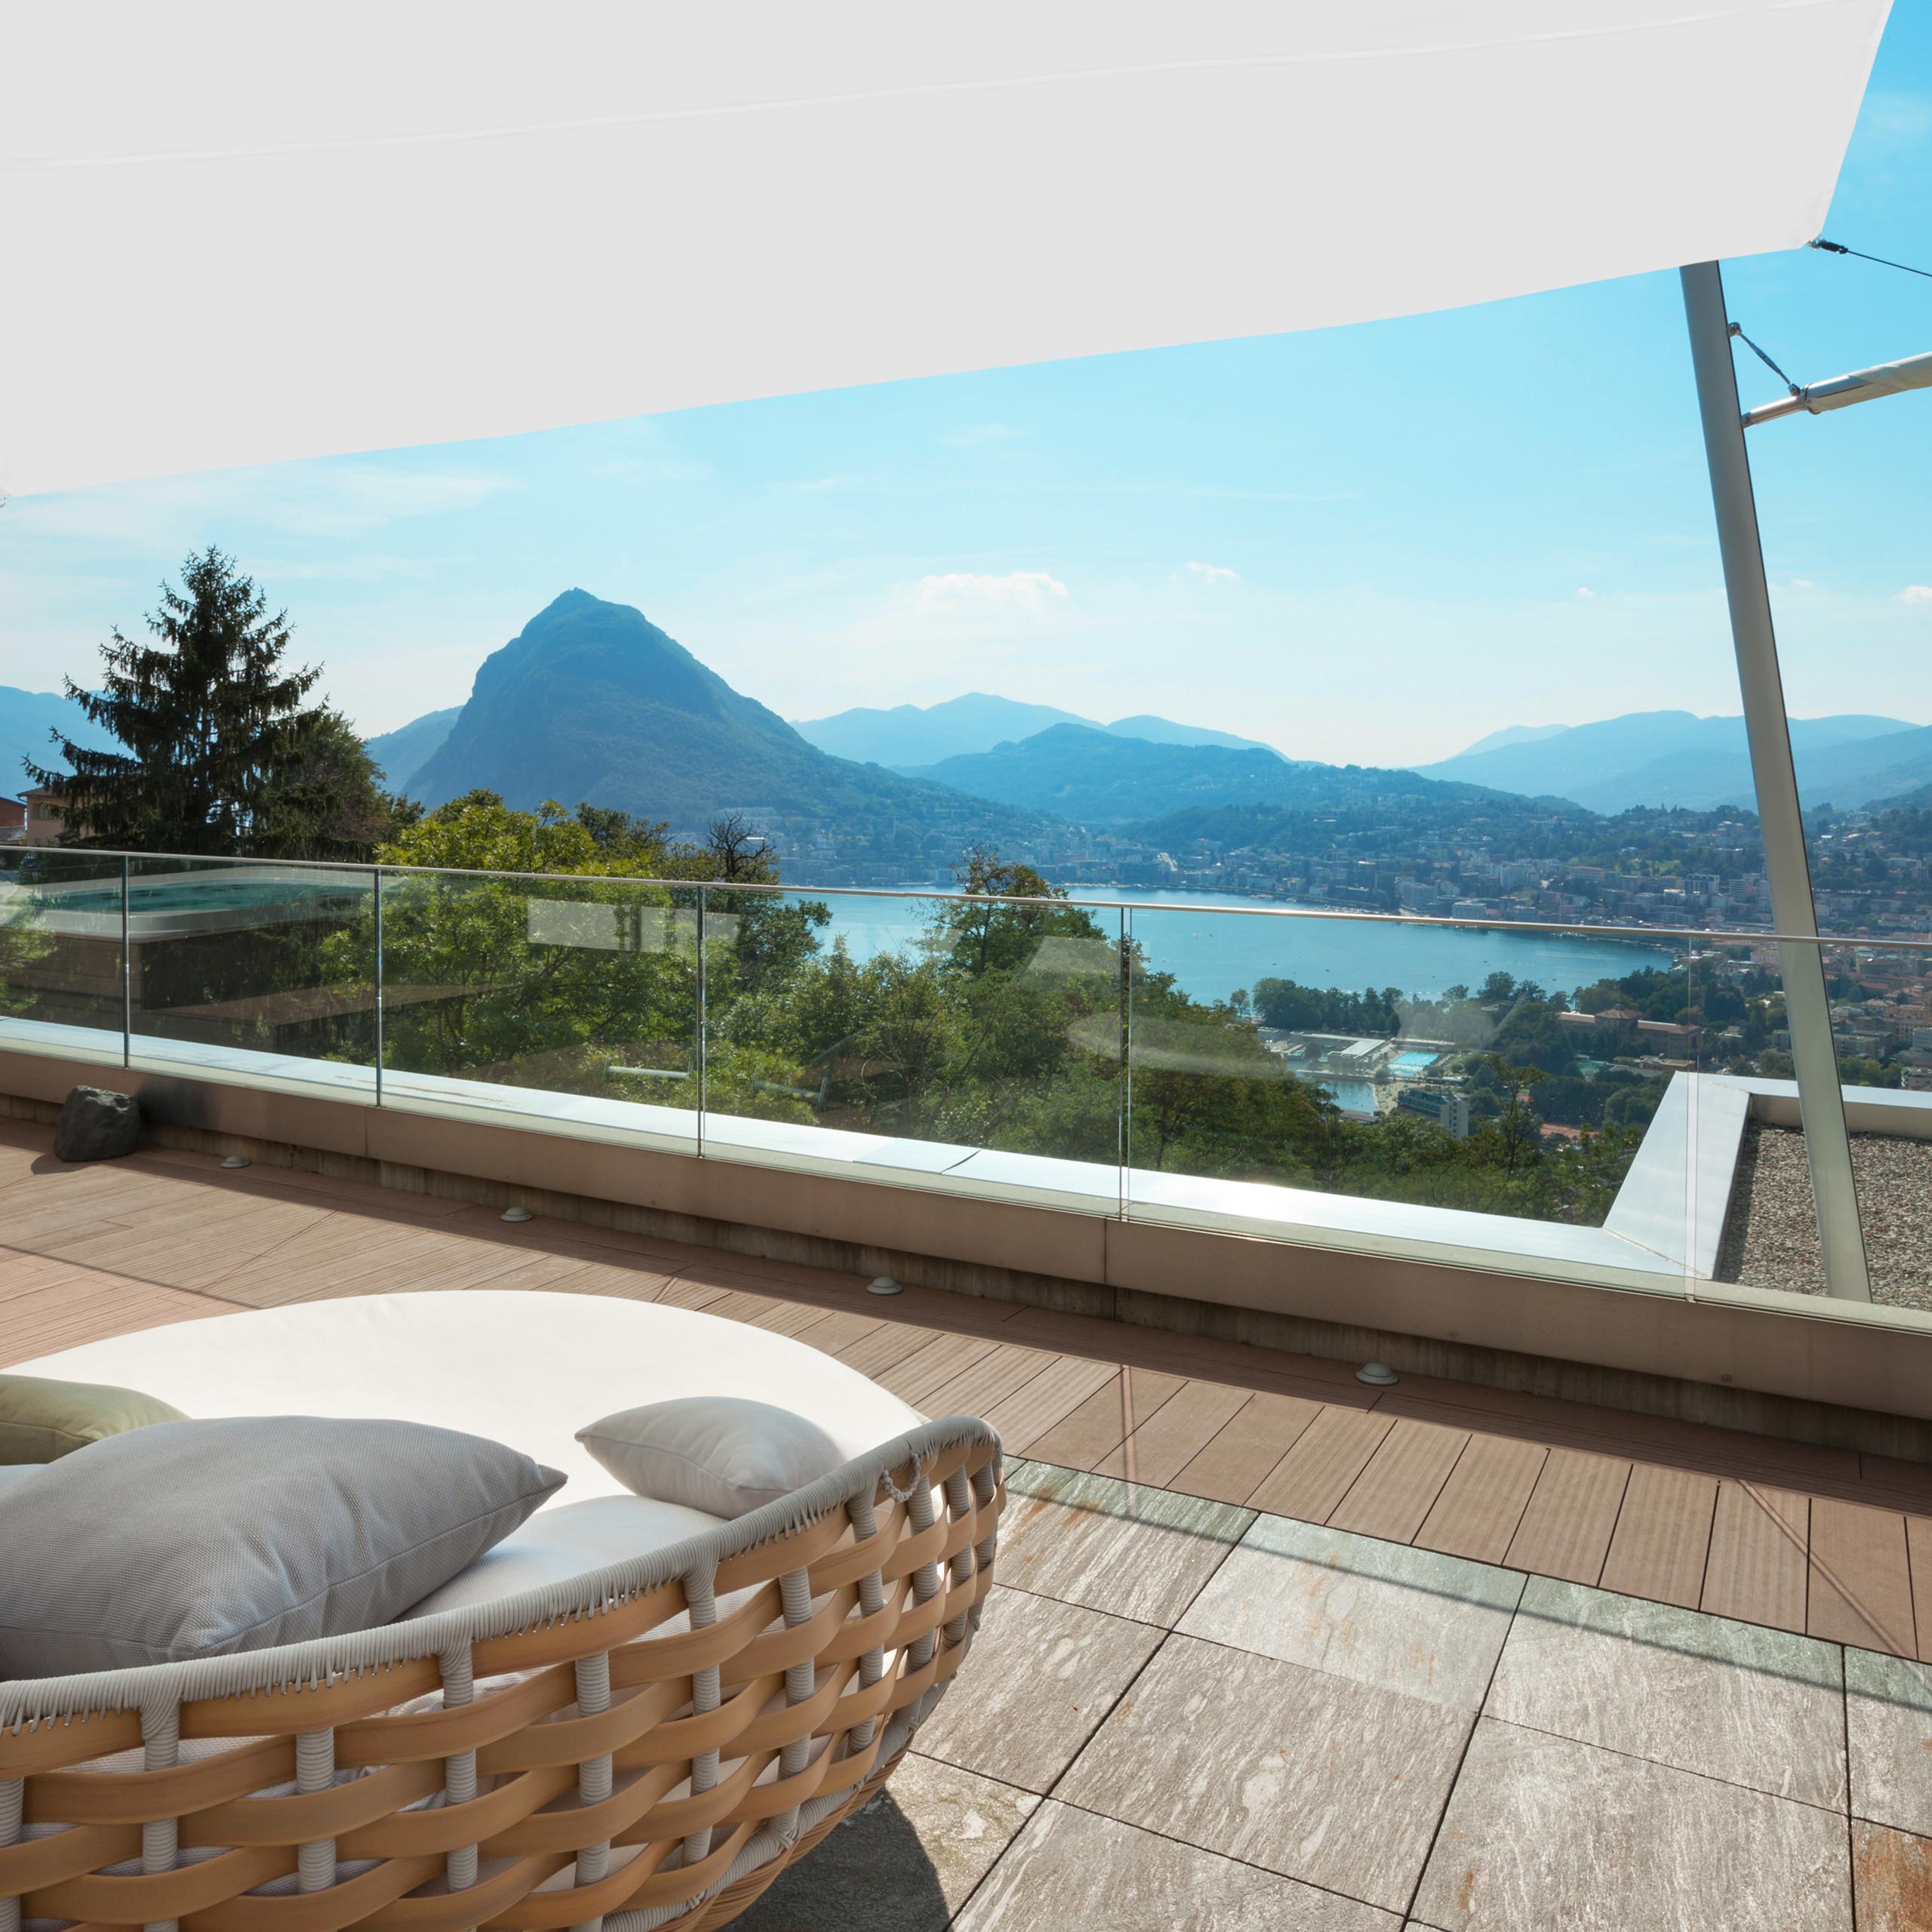 voile d ombrage trap ze diffuseur ombre protection soleil. Black Bedroom Furniture Sets. Home Design Ideas